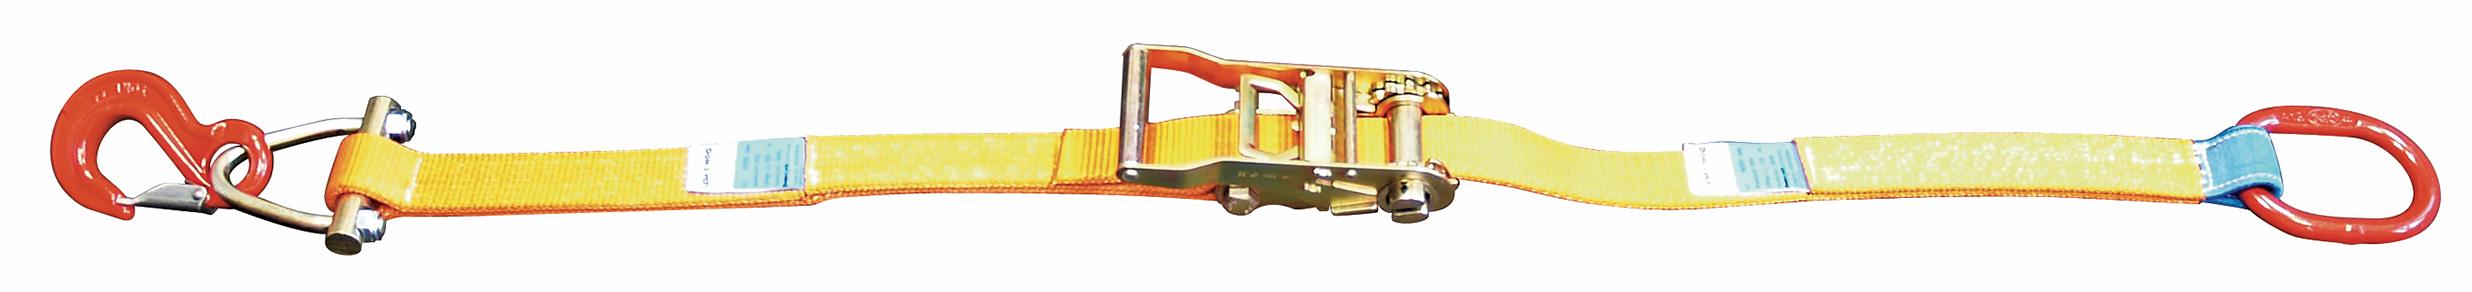 GWS®-Containersicherung - LC 4.000 daN